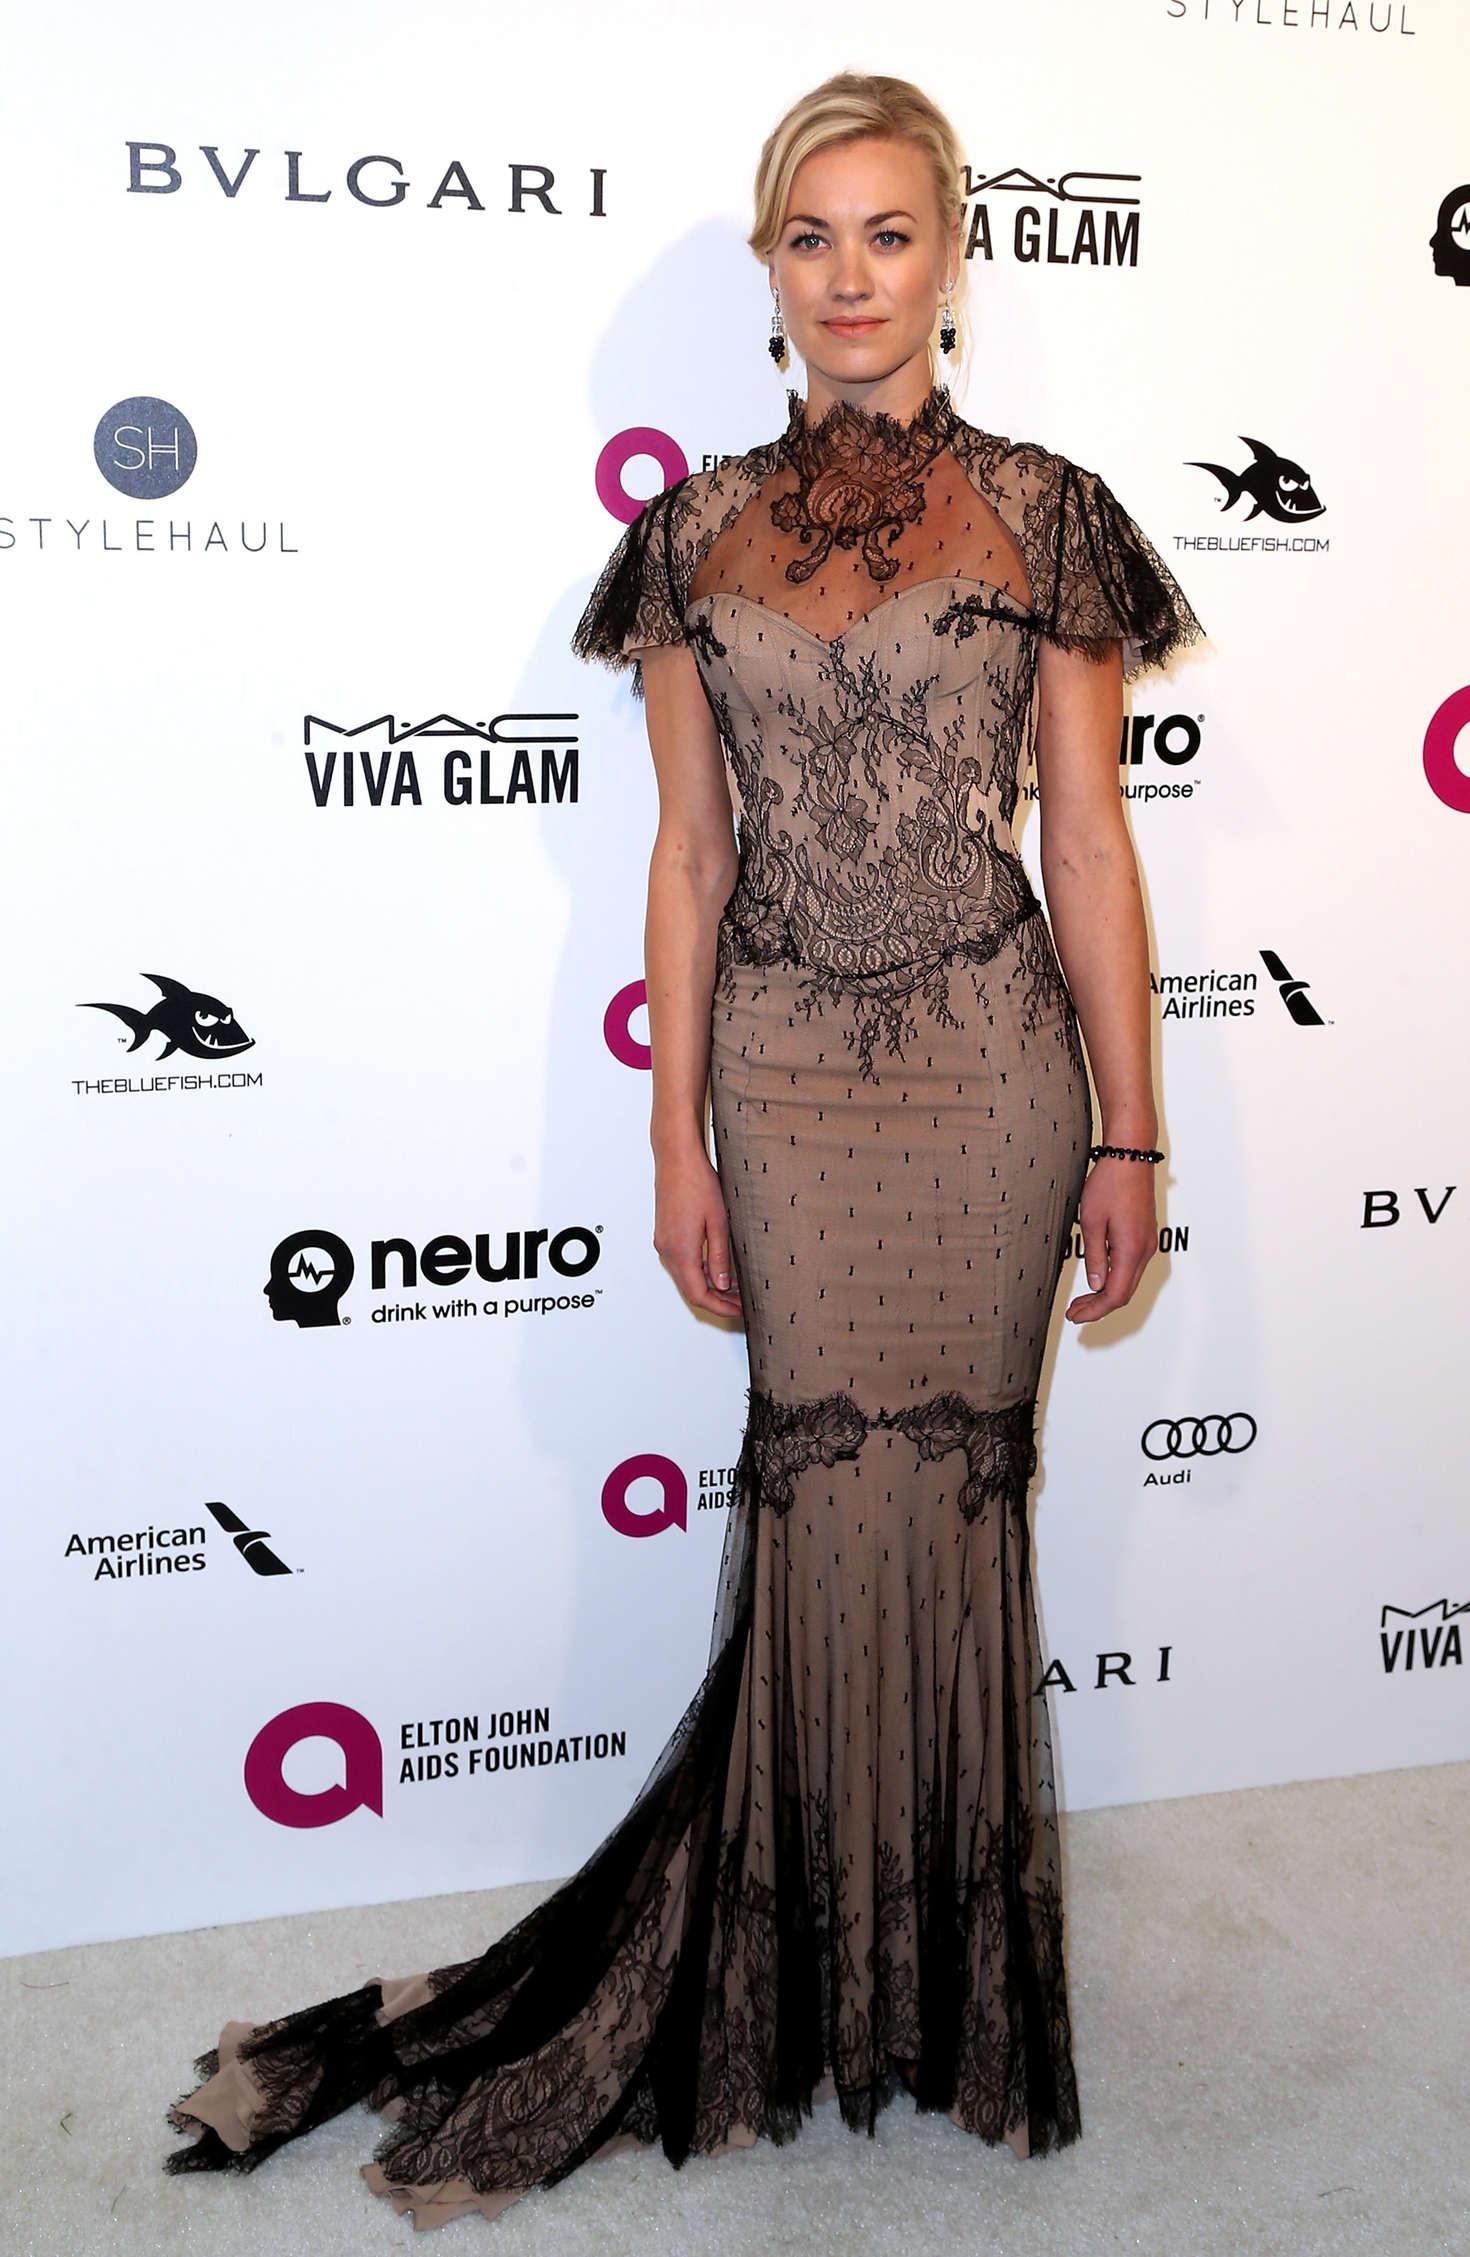 Yvonne Strahovski 2016 : Yvonne Strahovski: 2016 Elton John AIDS Foundations Oscar Viewing Party -02